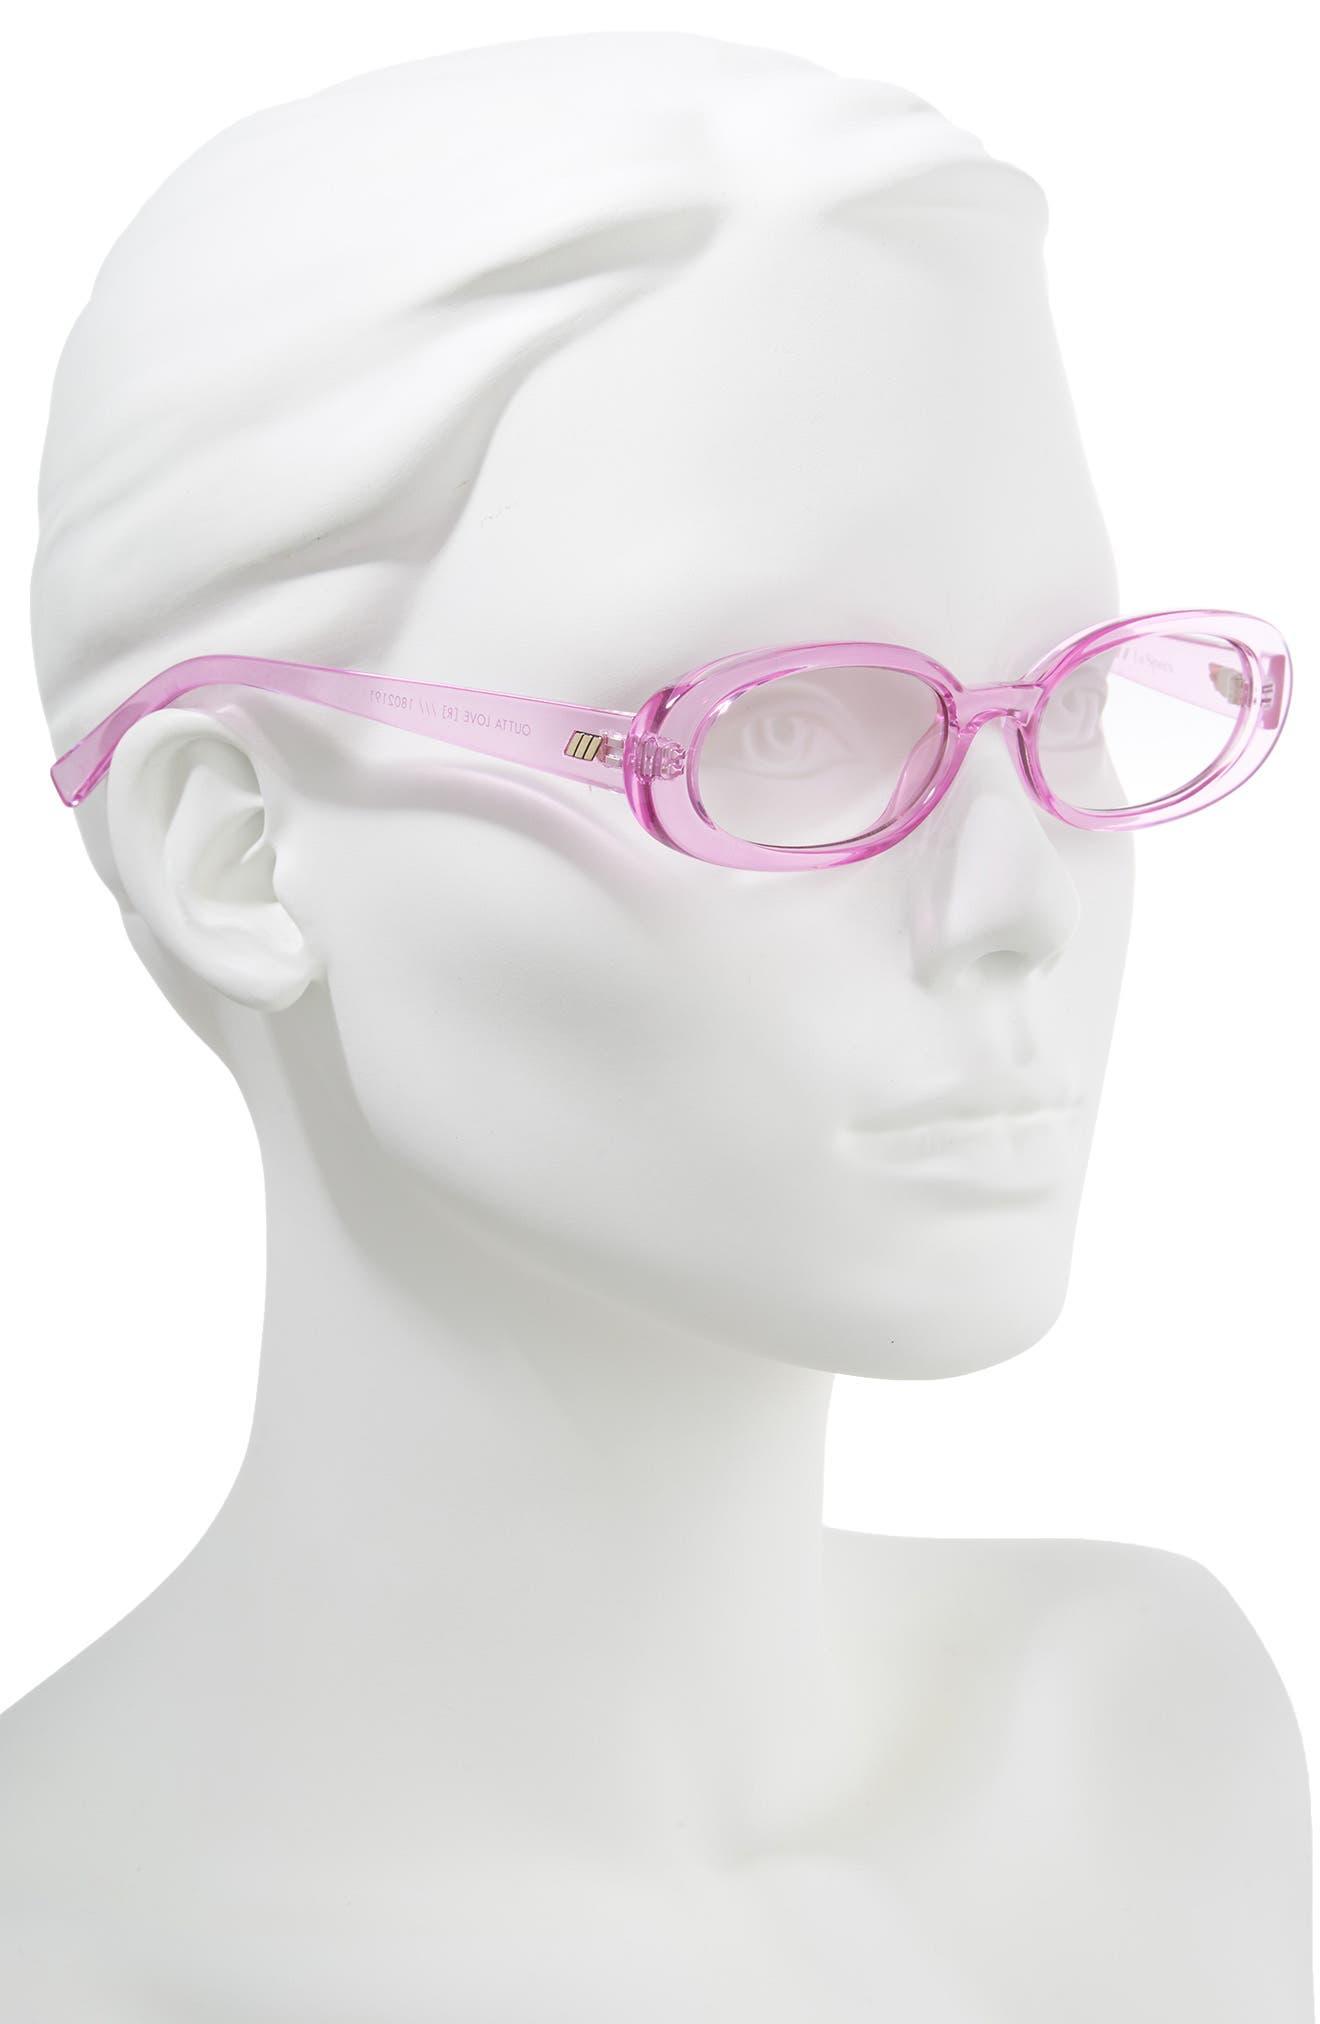 Outta Love 49mm Cat Eye Sunglasses,                             Alternate thumbnail 2, color,                             Powder-Puff